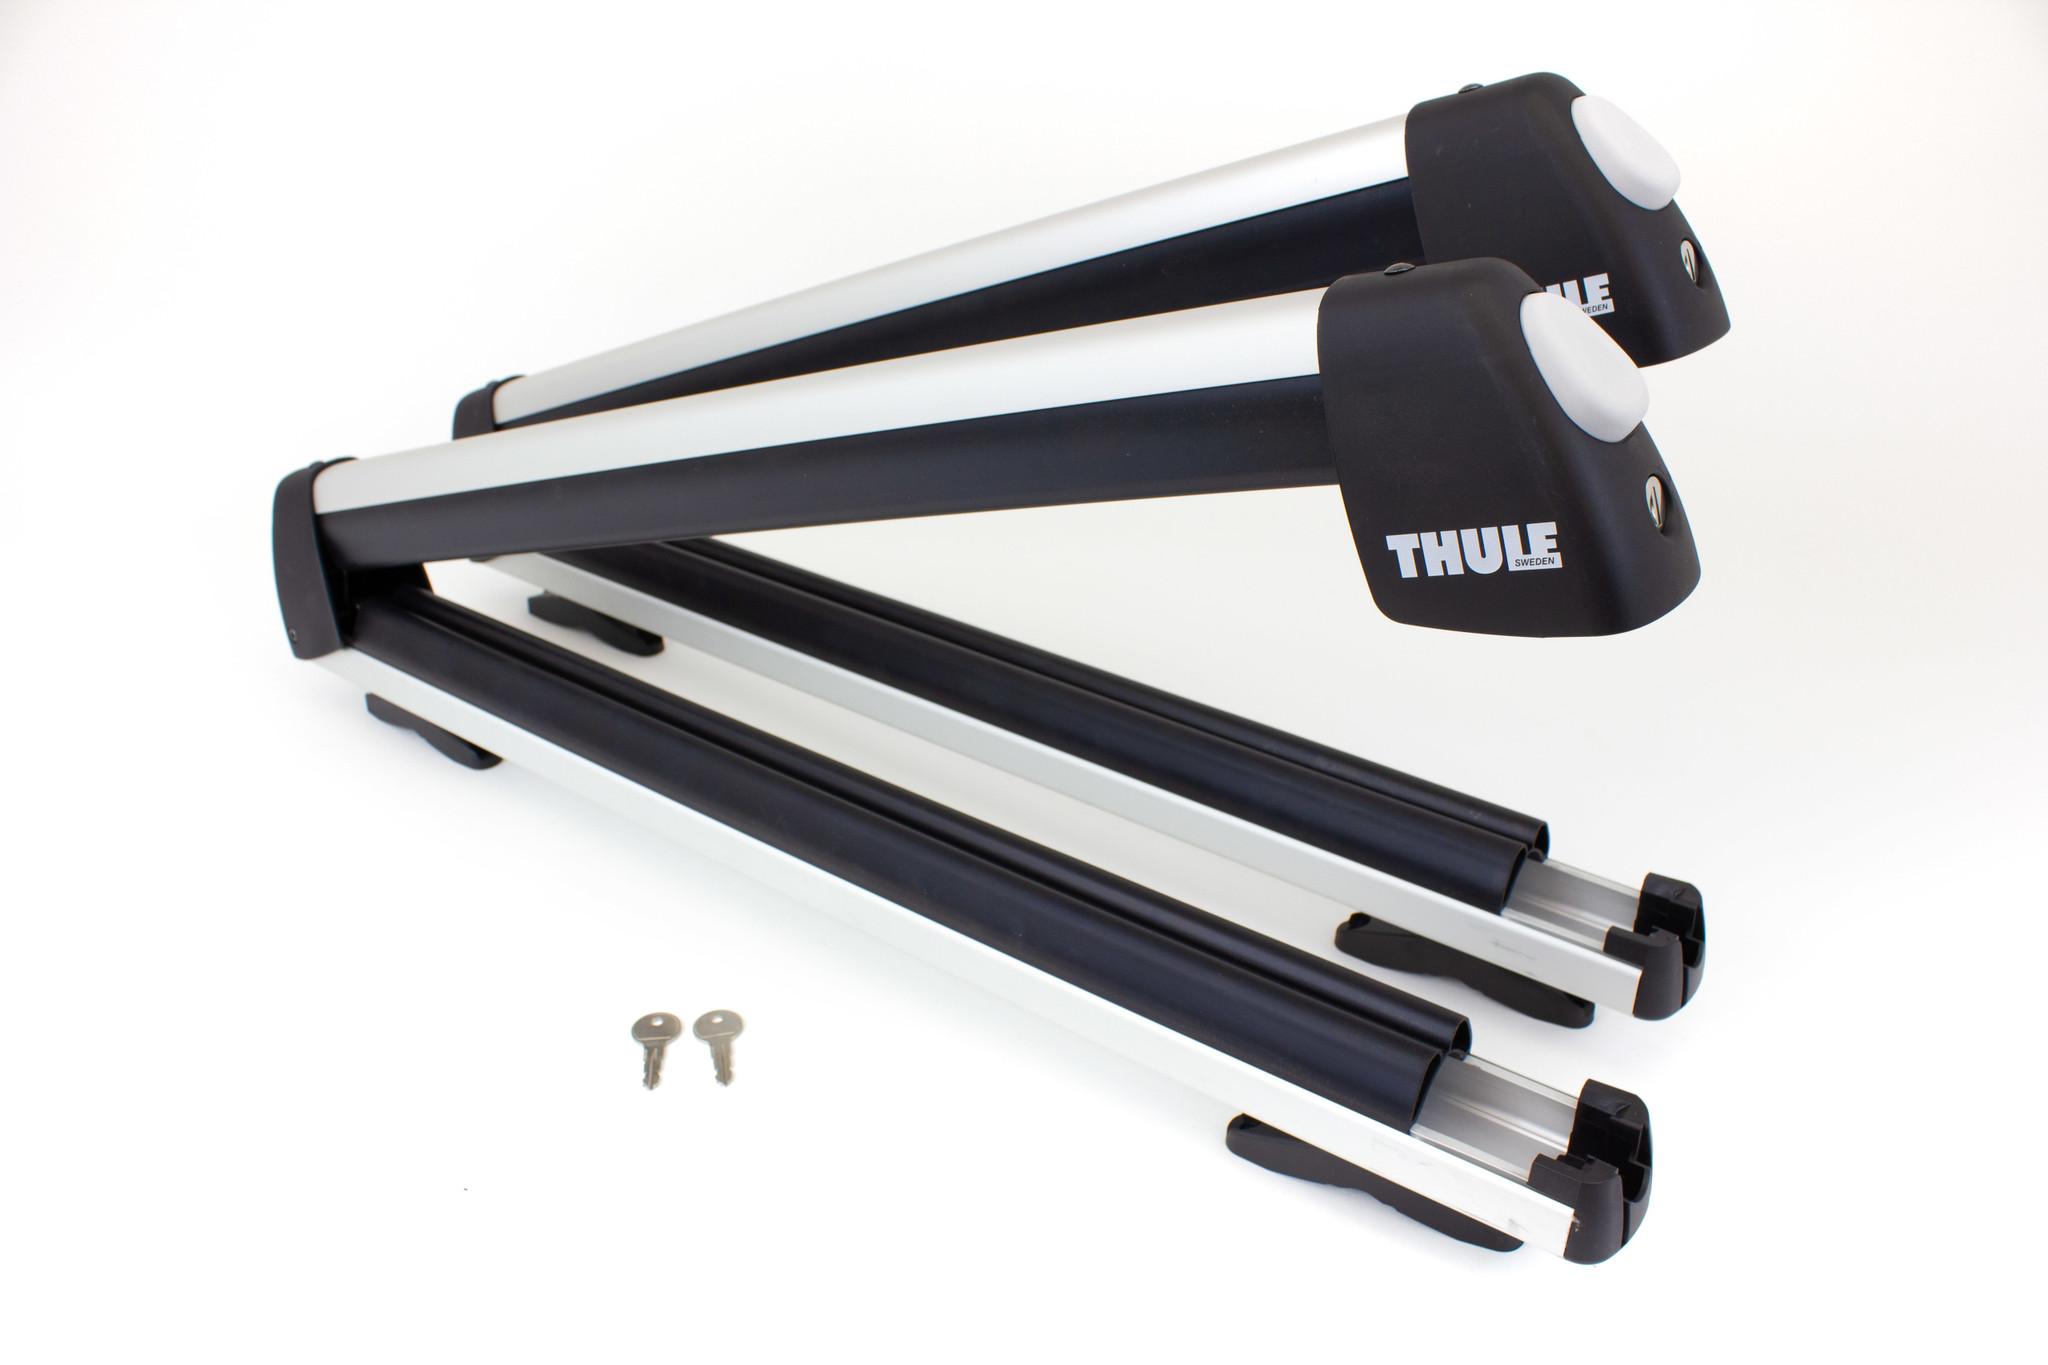 thule 91725u universal flat top 6 ski carrier